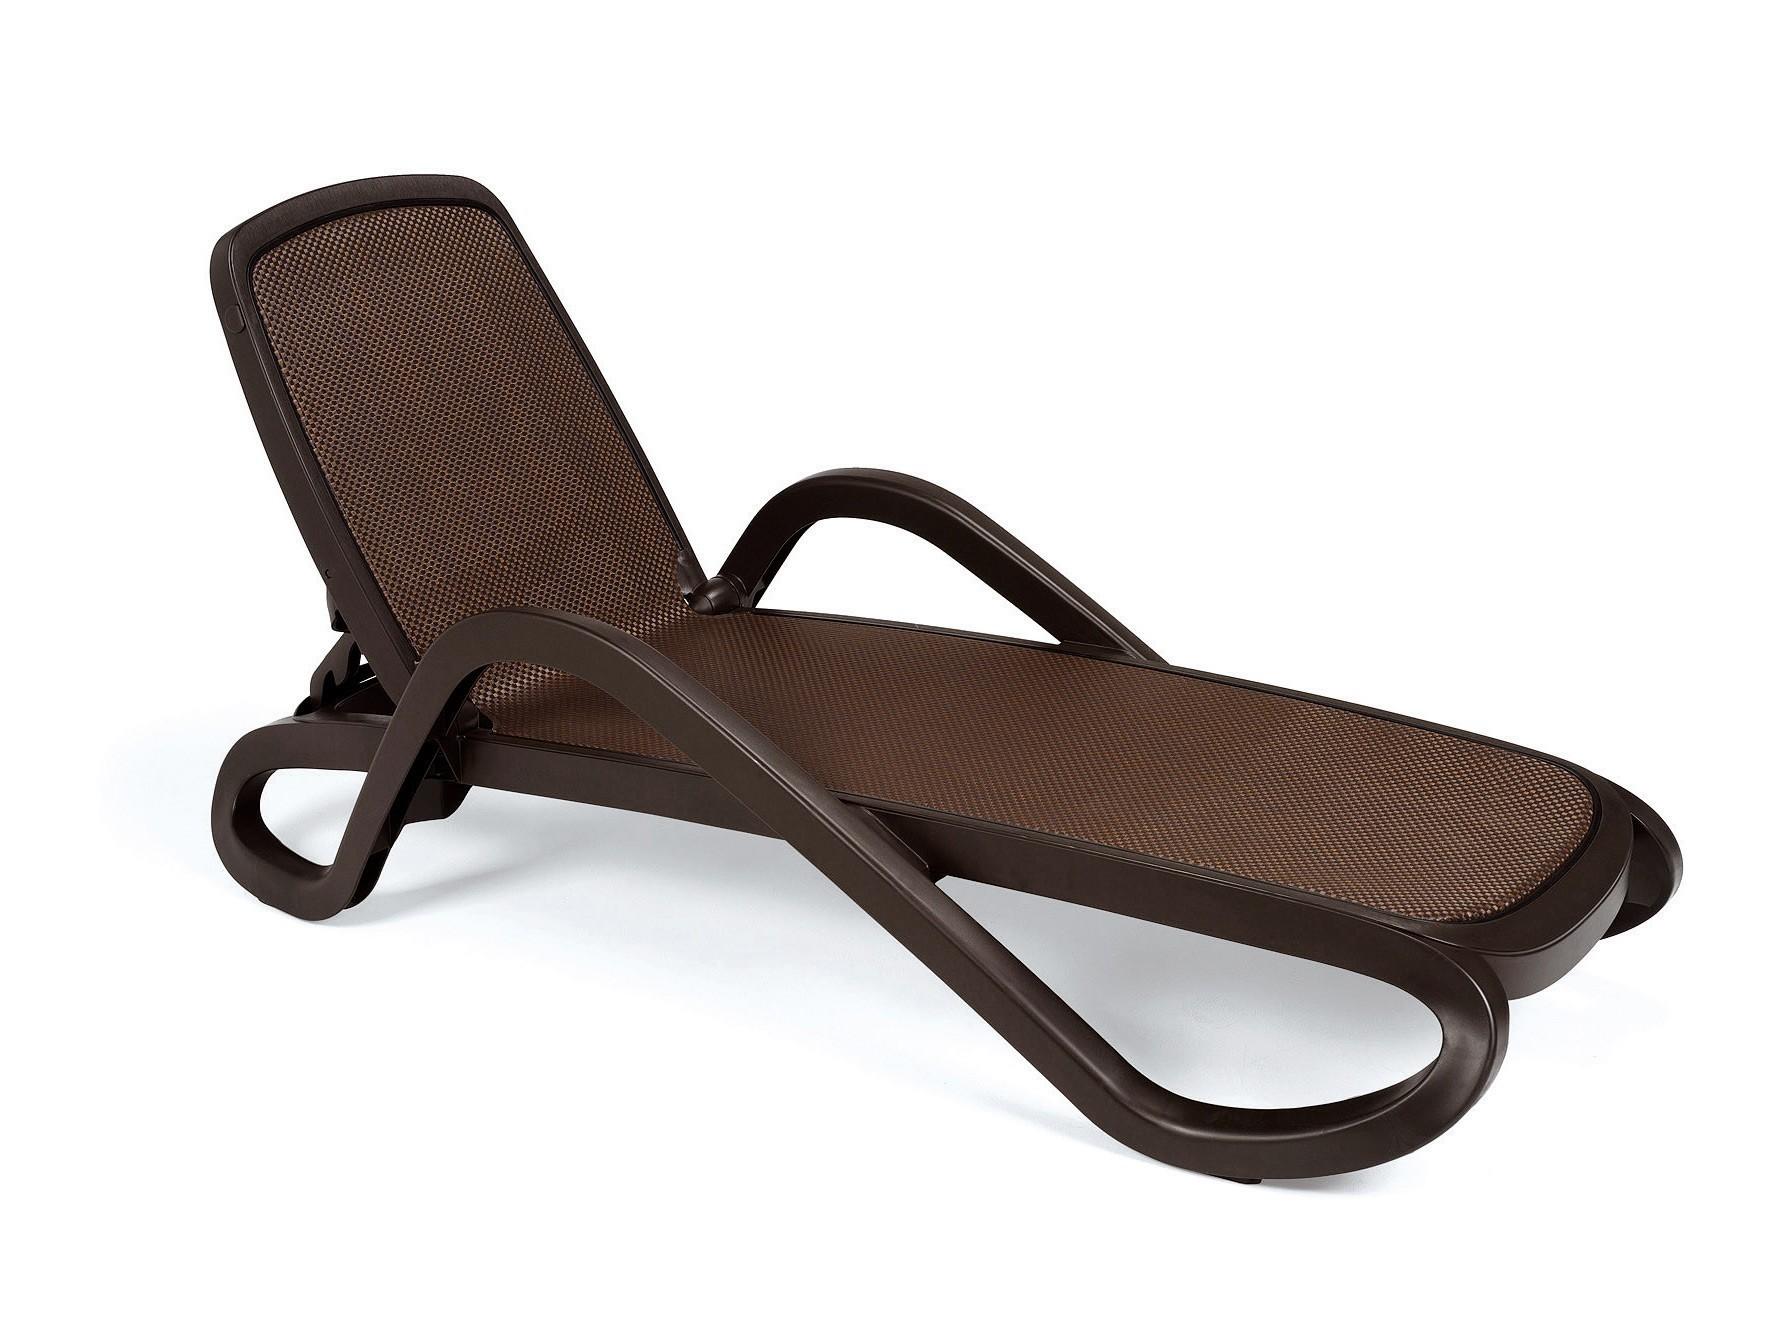 gartenliege stapelbar caffeebraun kunststoff bei. Black Bedroom Furniture Sets. Home Design Ideas